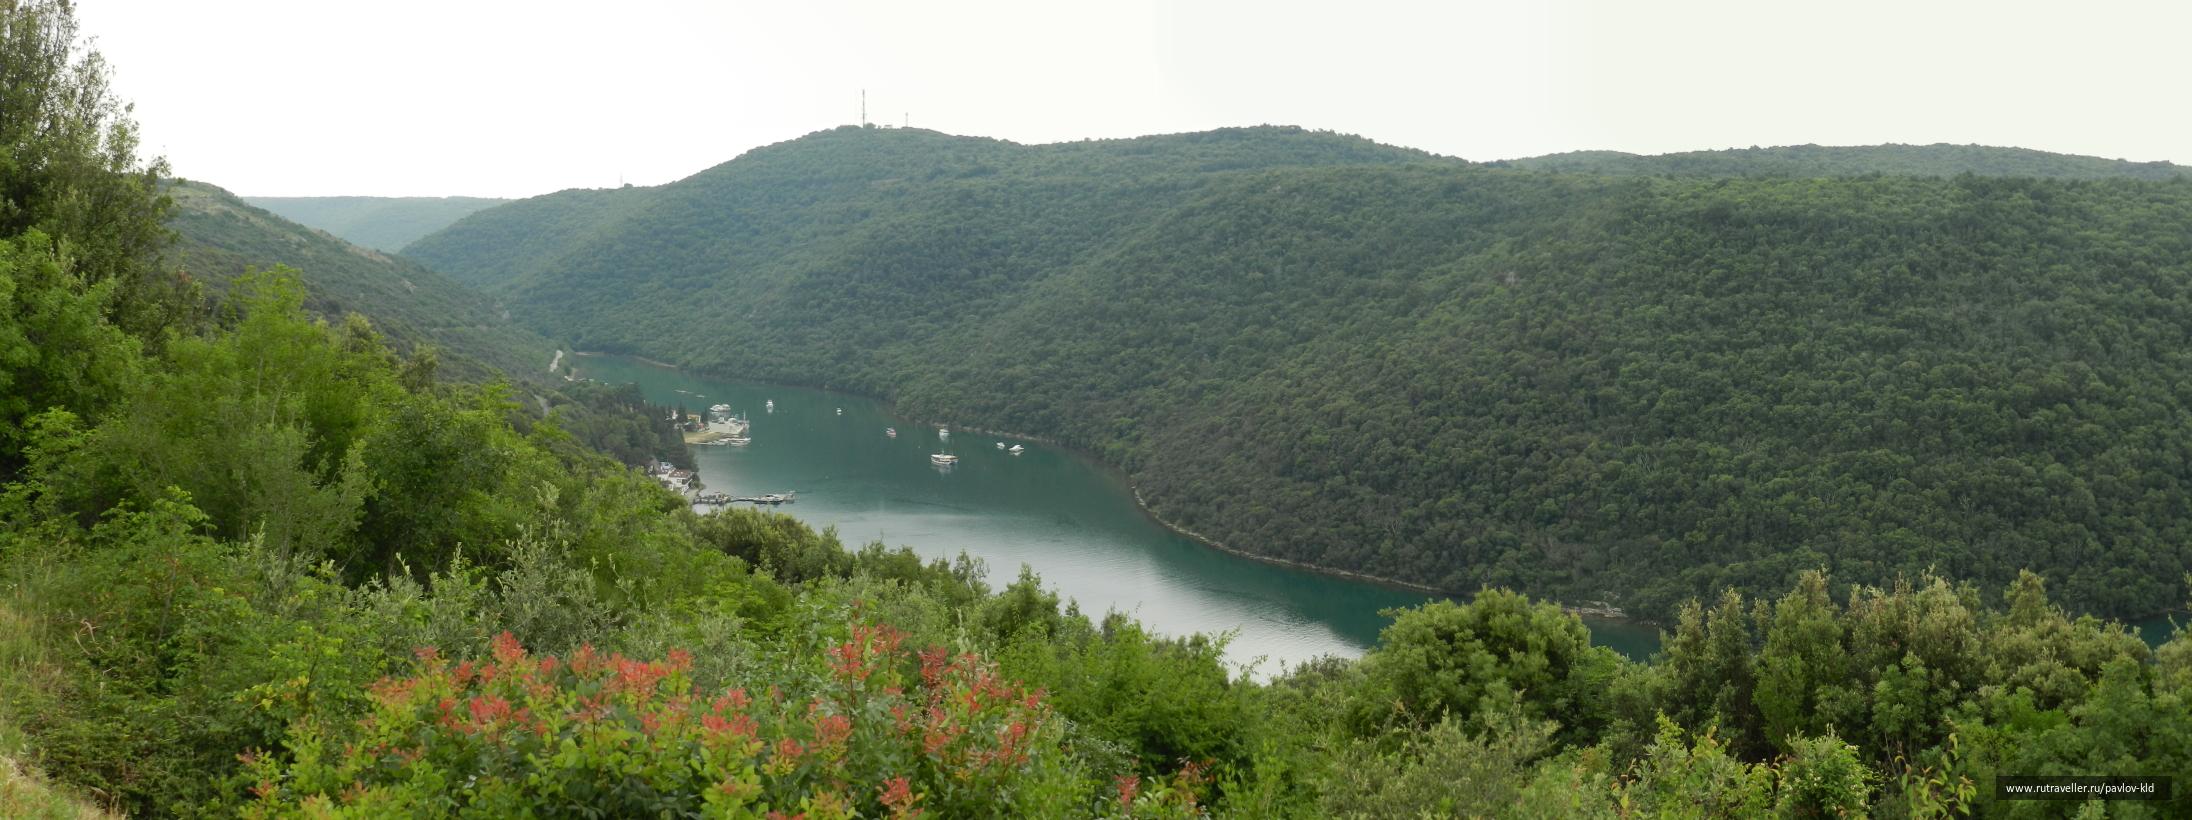 Panorama 56